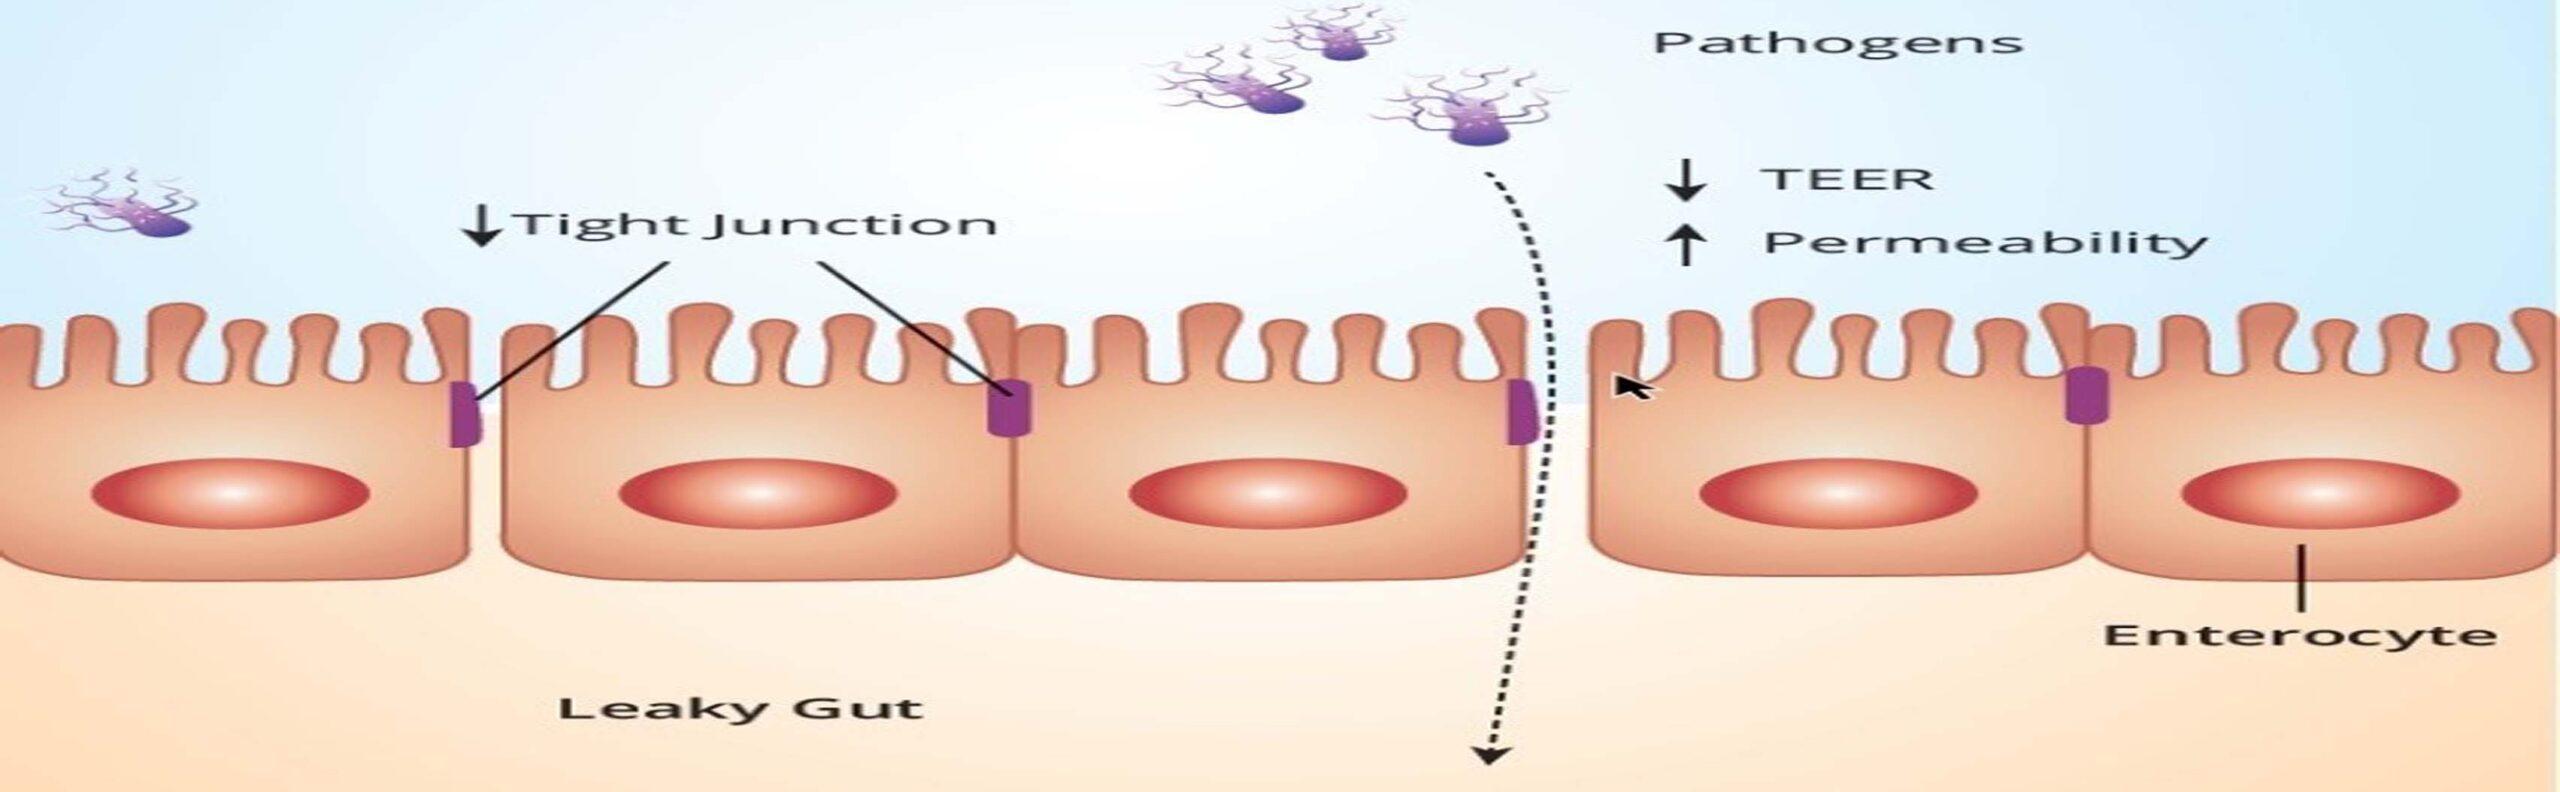 Endotoxins increases Oxidative stress